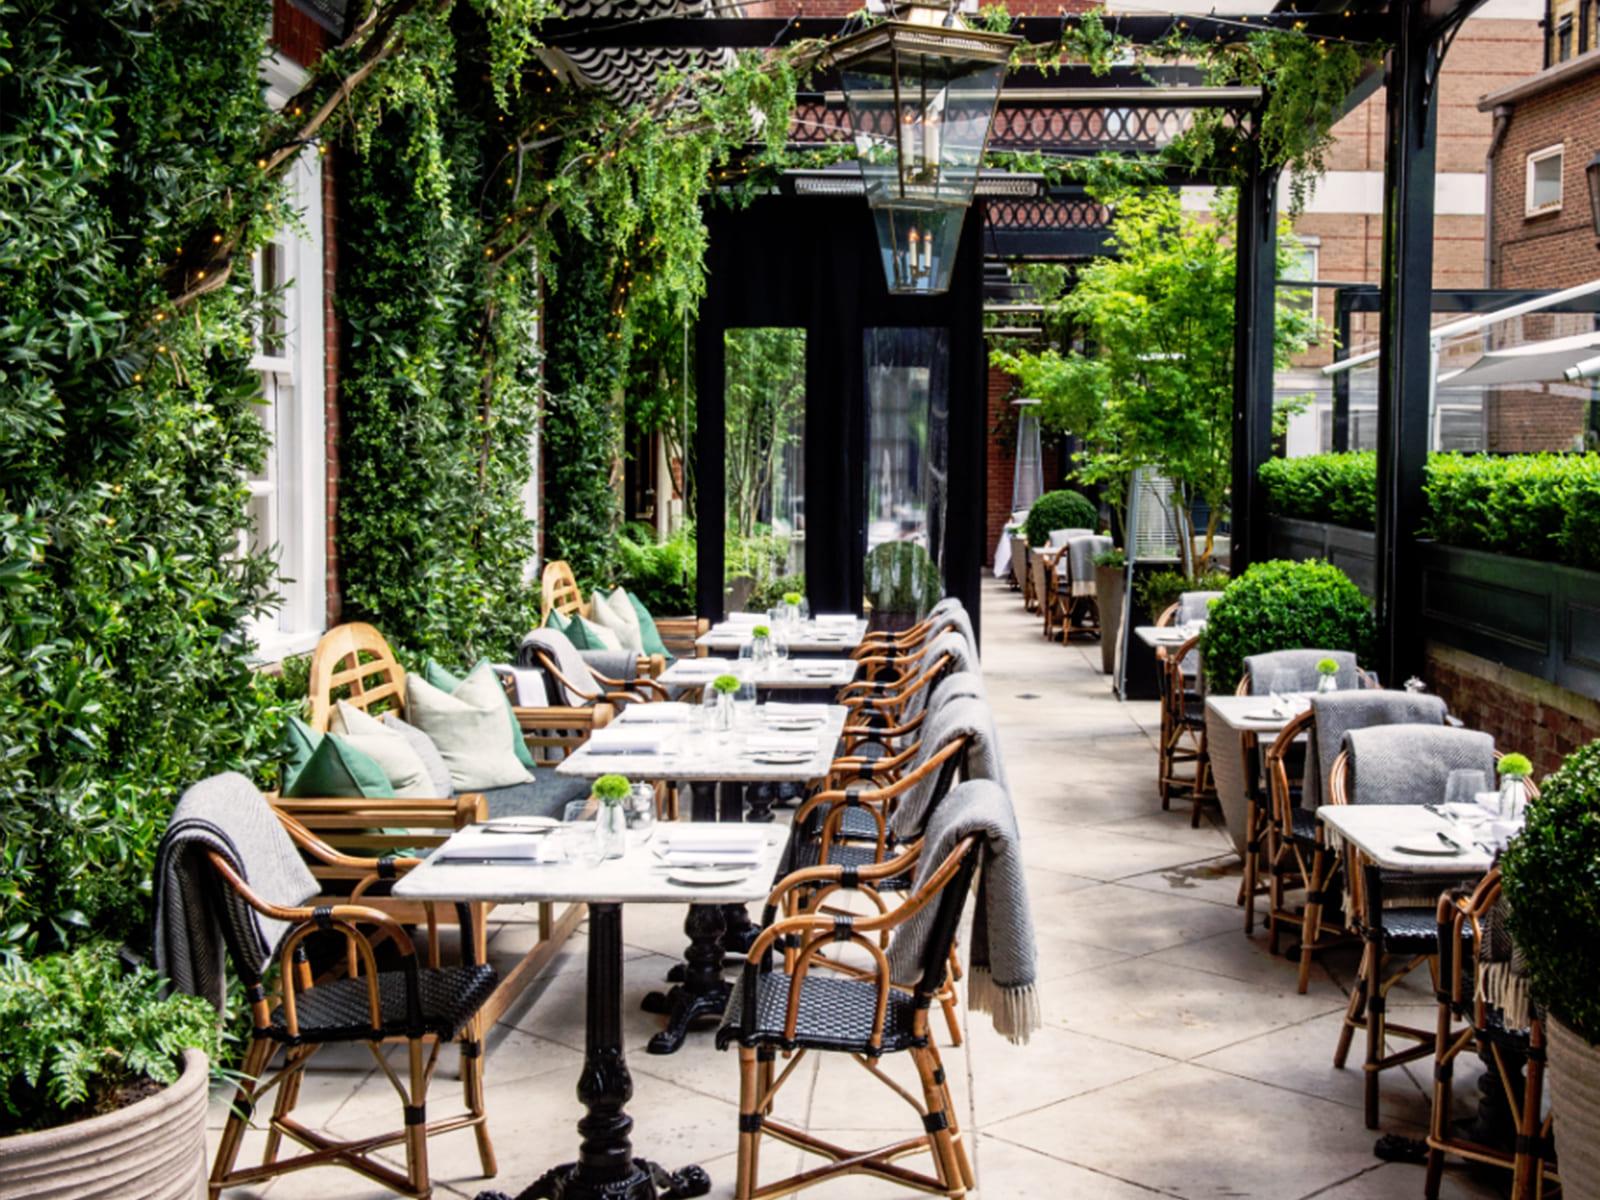 blog-vegetacion-decoracion-bares-restaurantes-15_HIDROJARDIN-Bañeres